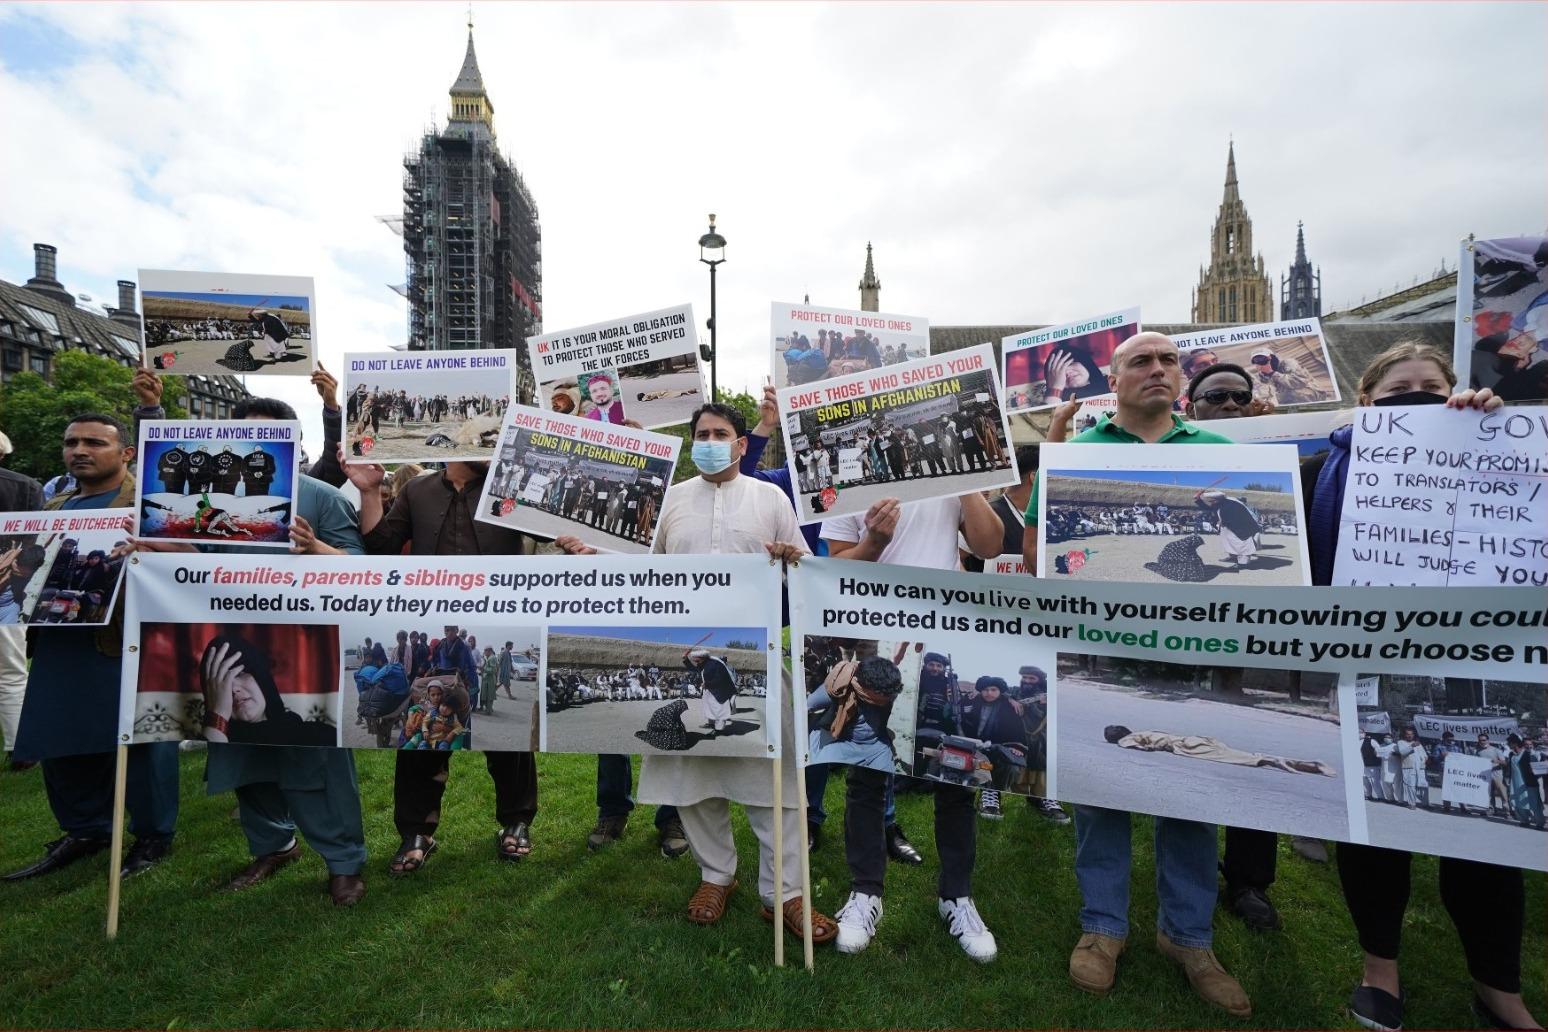 Former translators demand protection for Afghans at Parliament Square protest